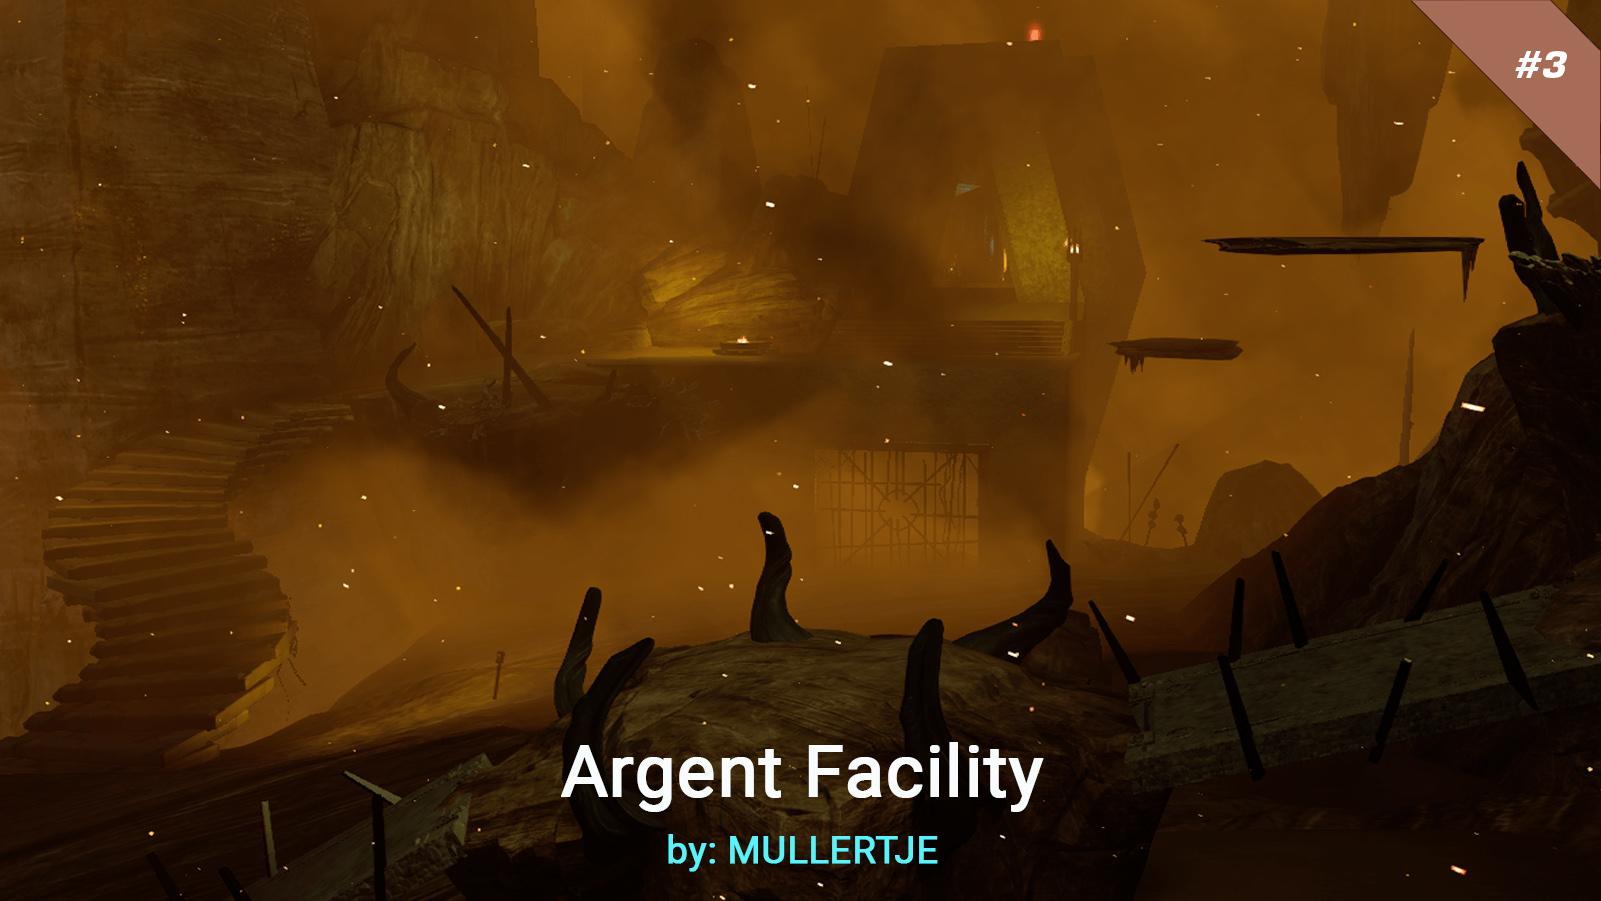 argentfacility3.jpg